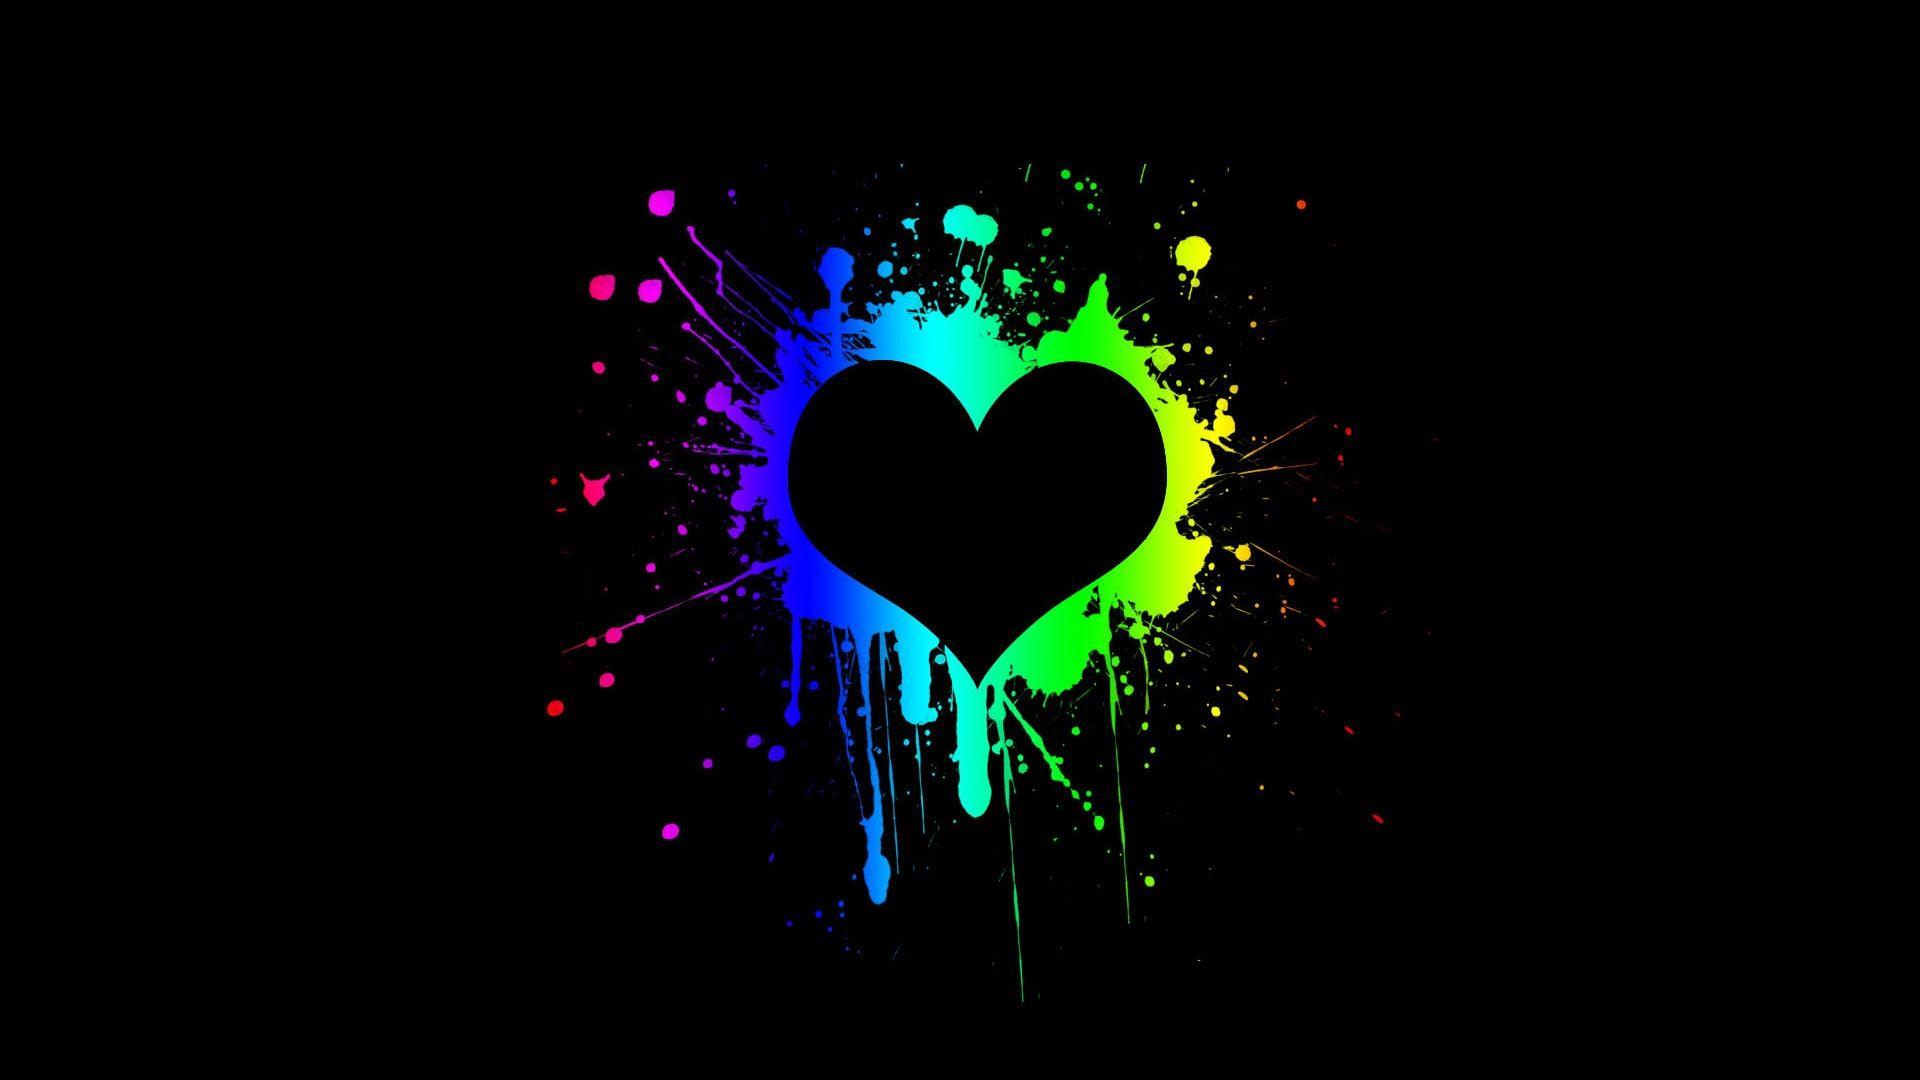 Wallpaper Hd Abstract Love